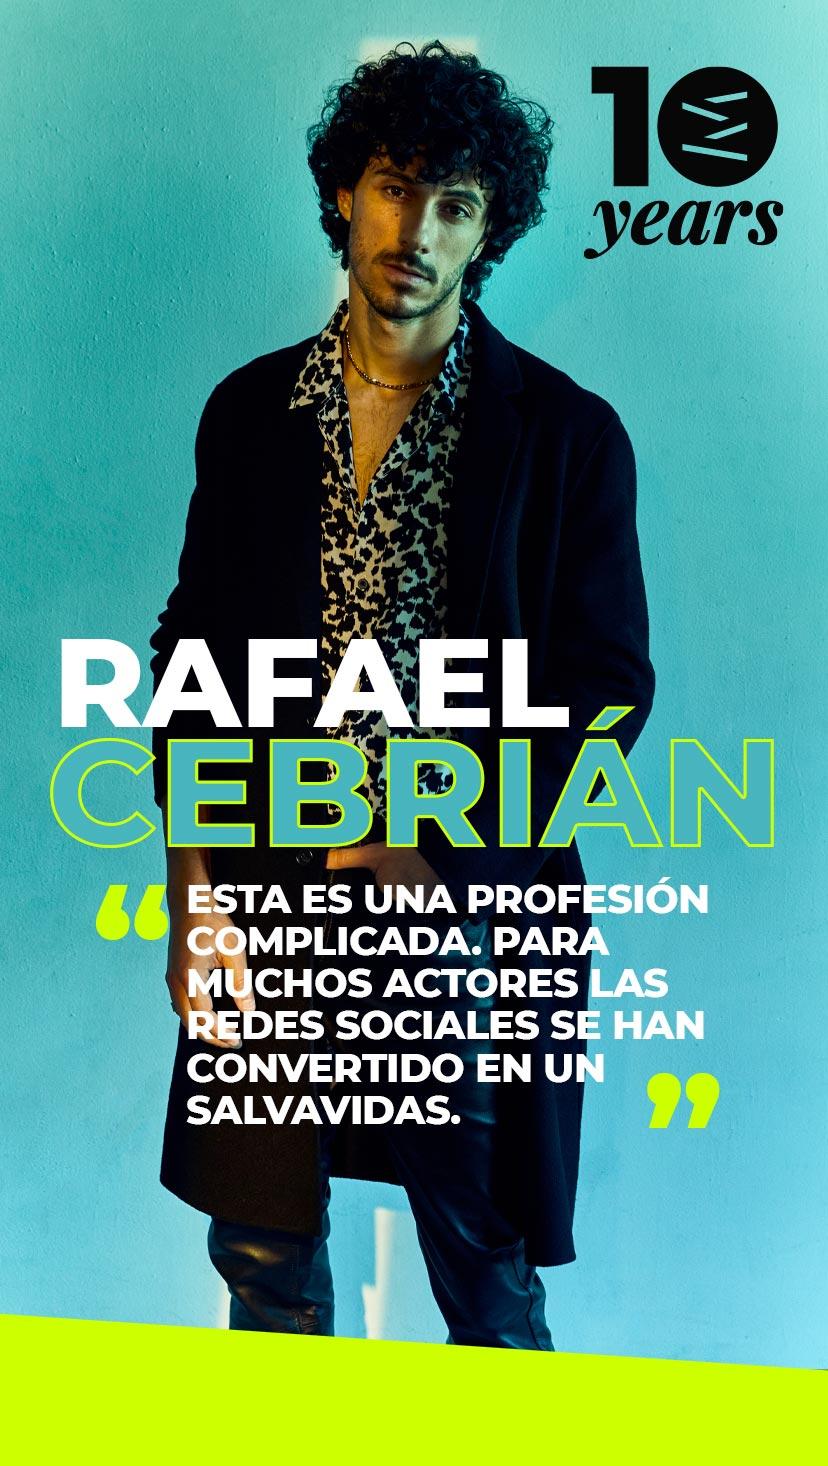 rafael-cebrian-madmenmag-entrevista